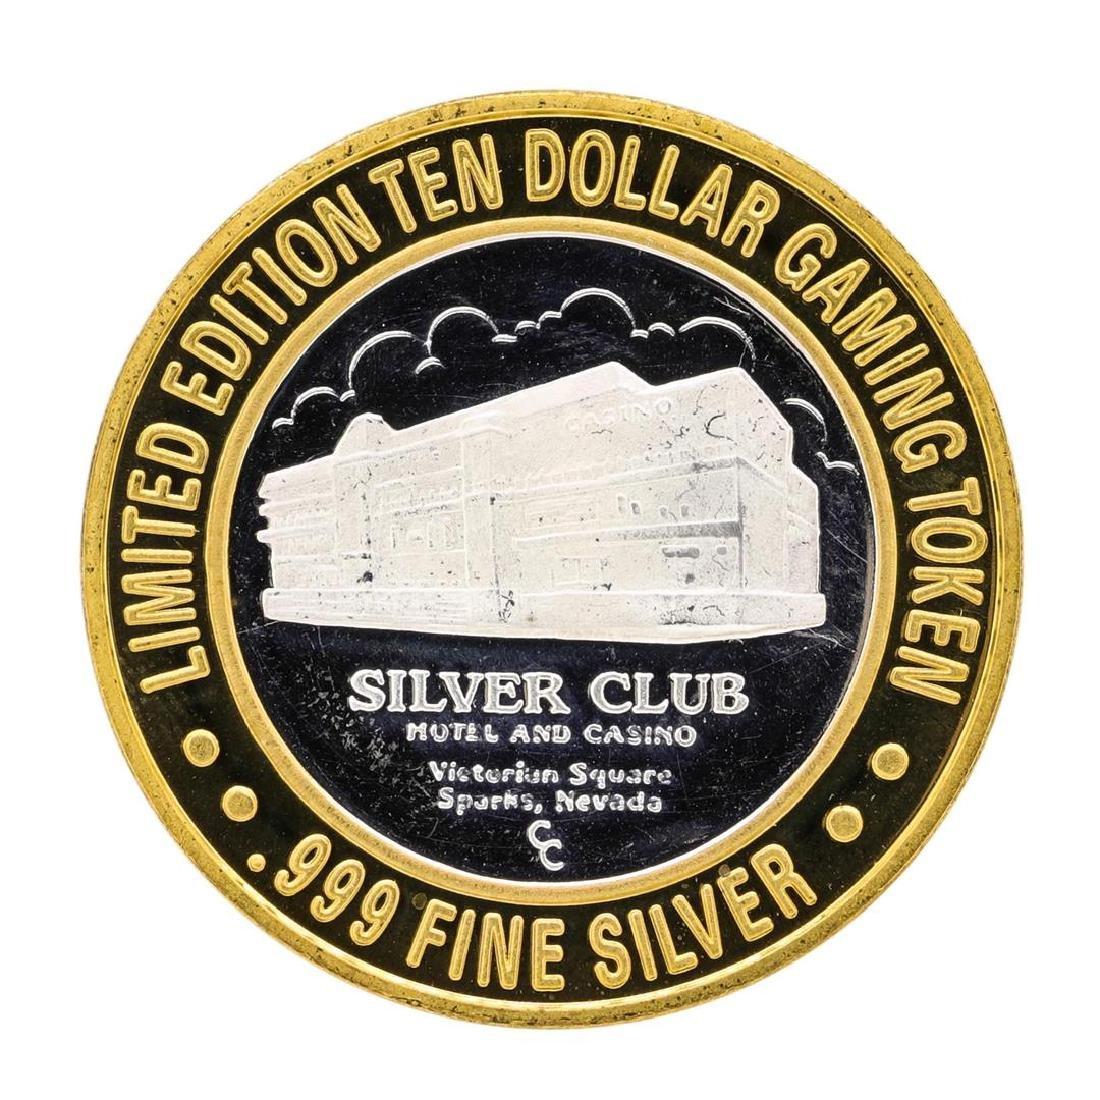 .999 Silver Club Sparks, Nevada $10 Casino Limited